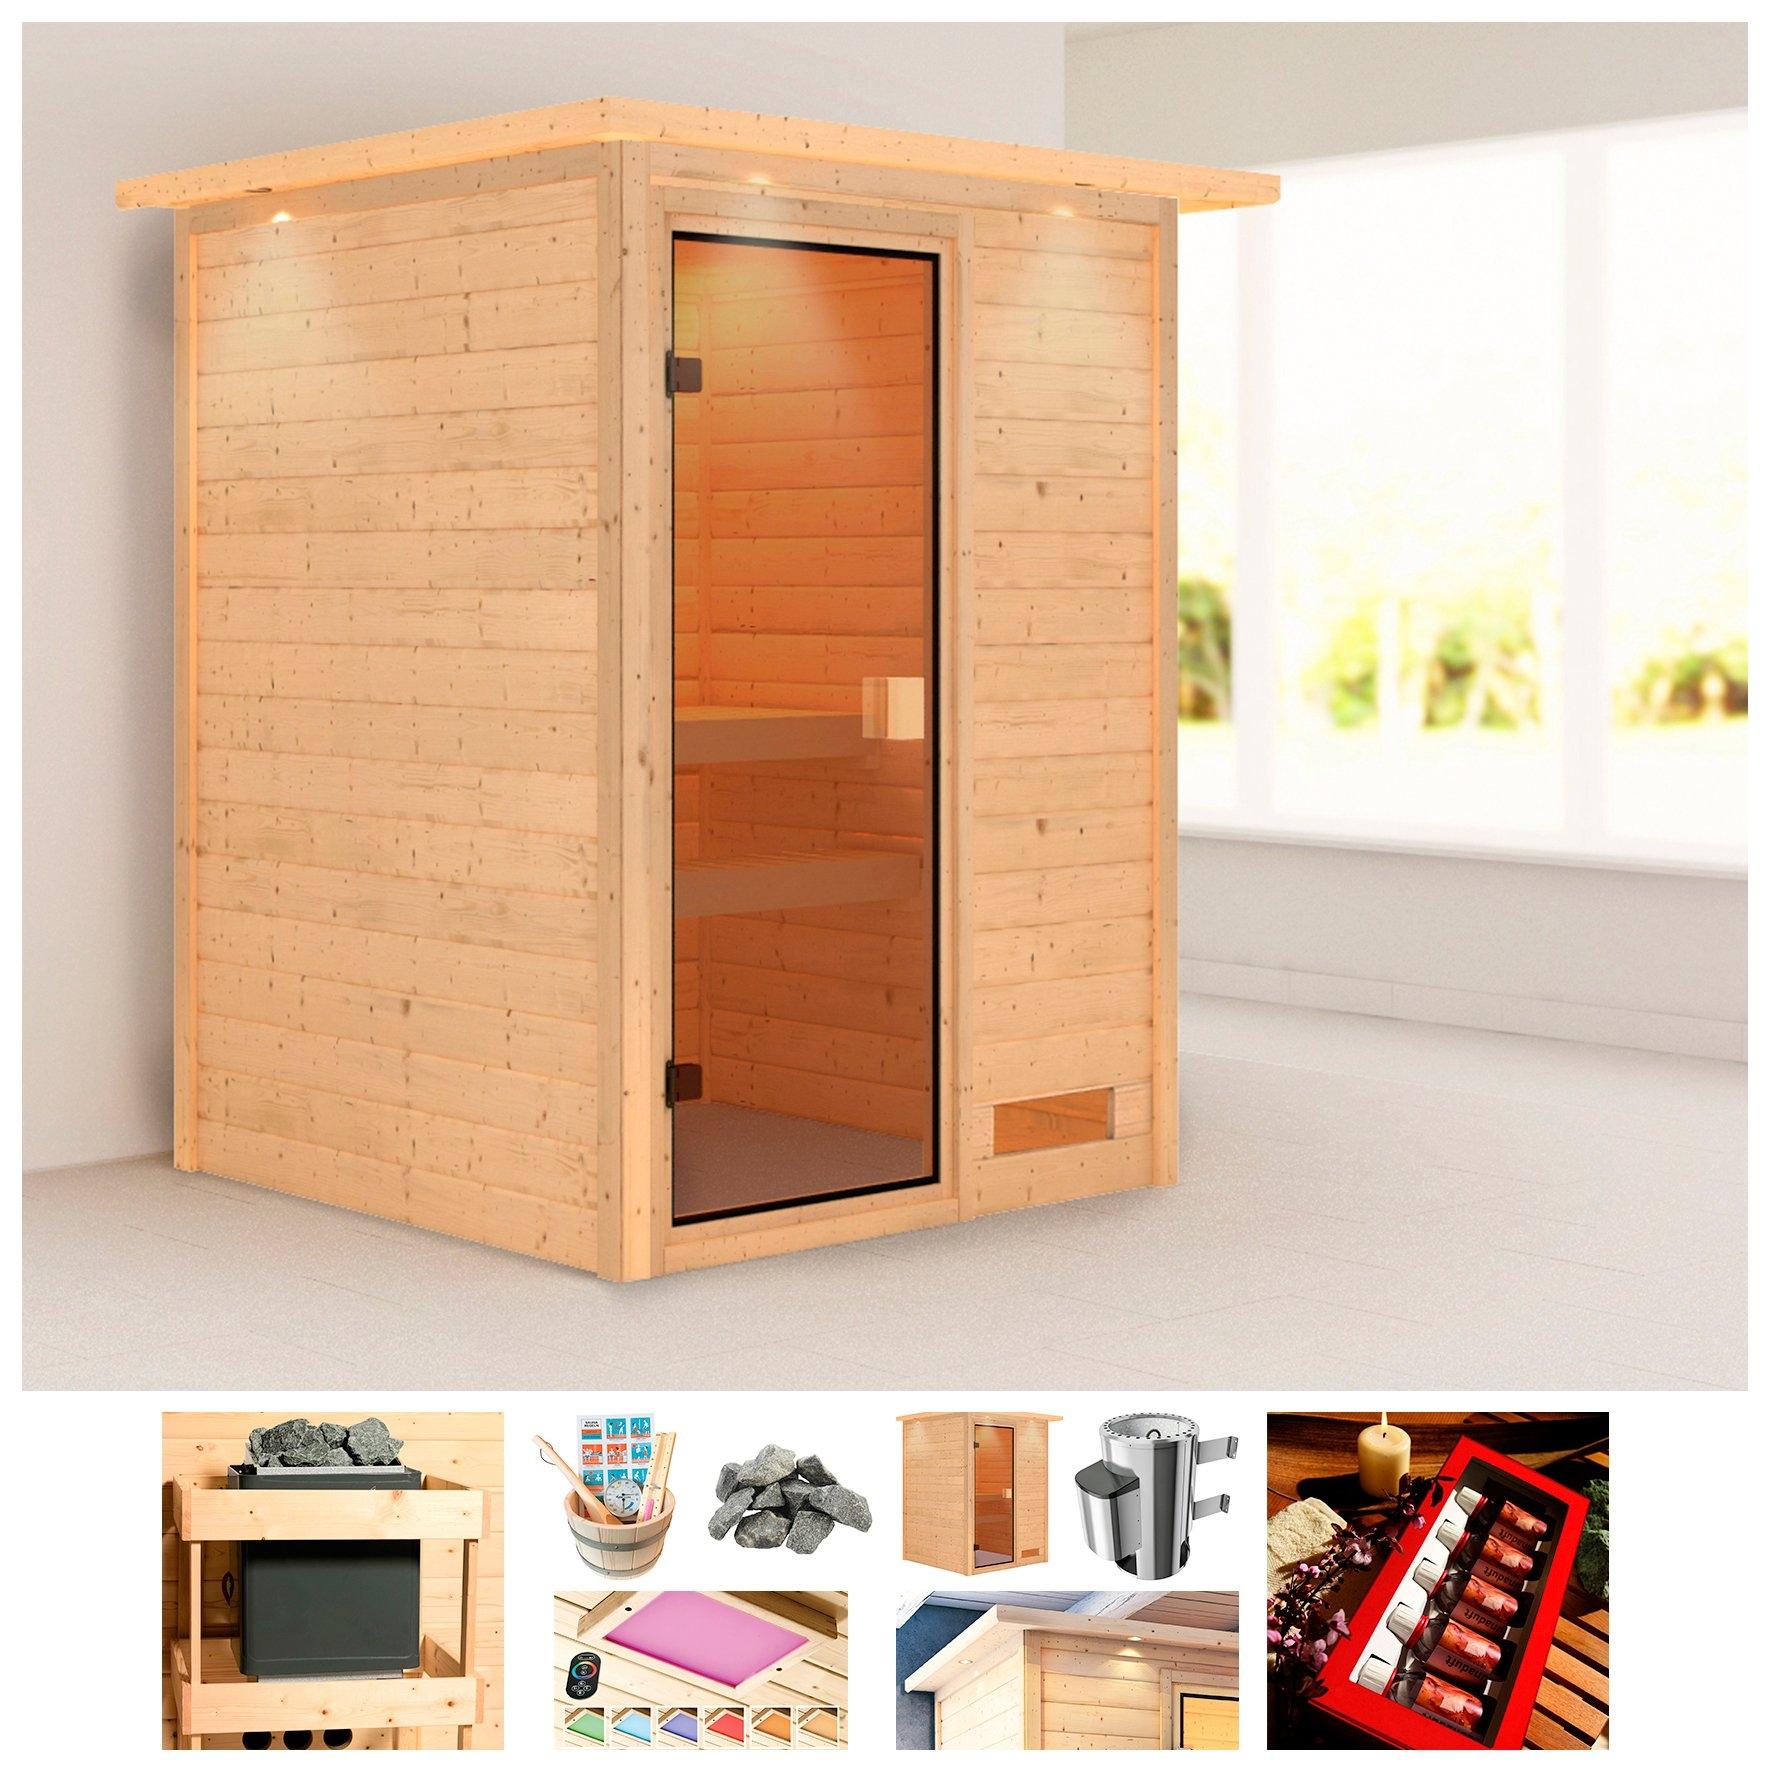 KONIFERA sauna »Erica«, 174x160x202 cm, 3,6 kW Plug & Play kachel met int. bediening nu online bestellen